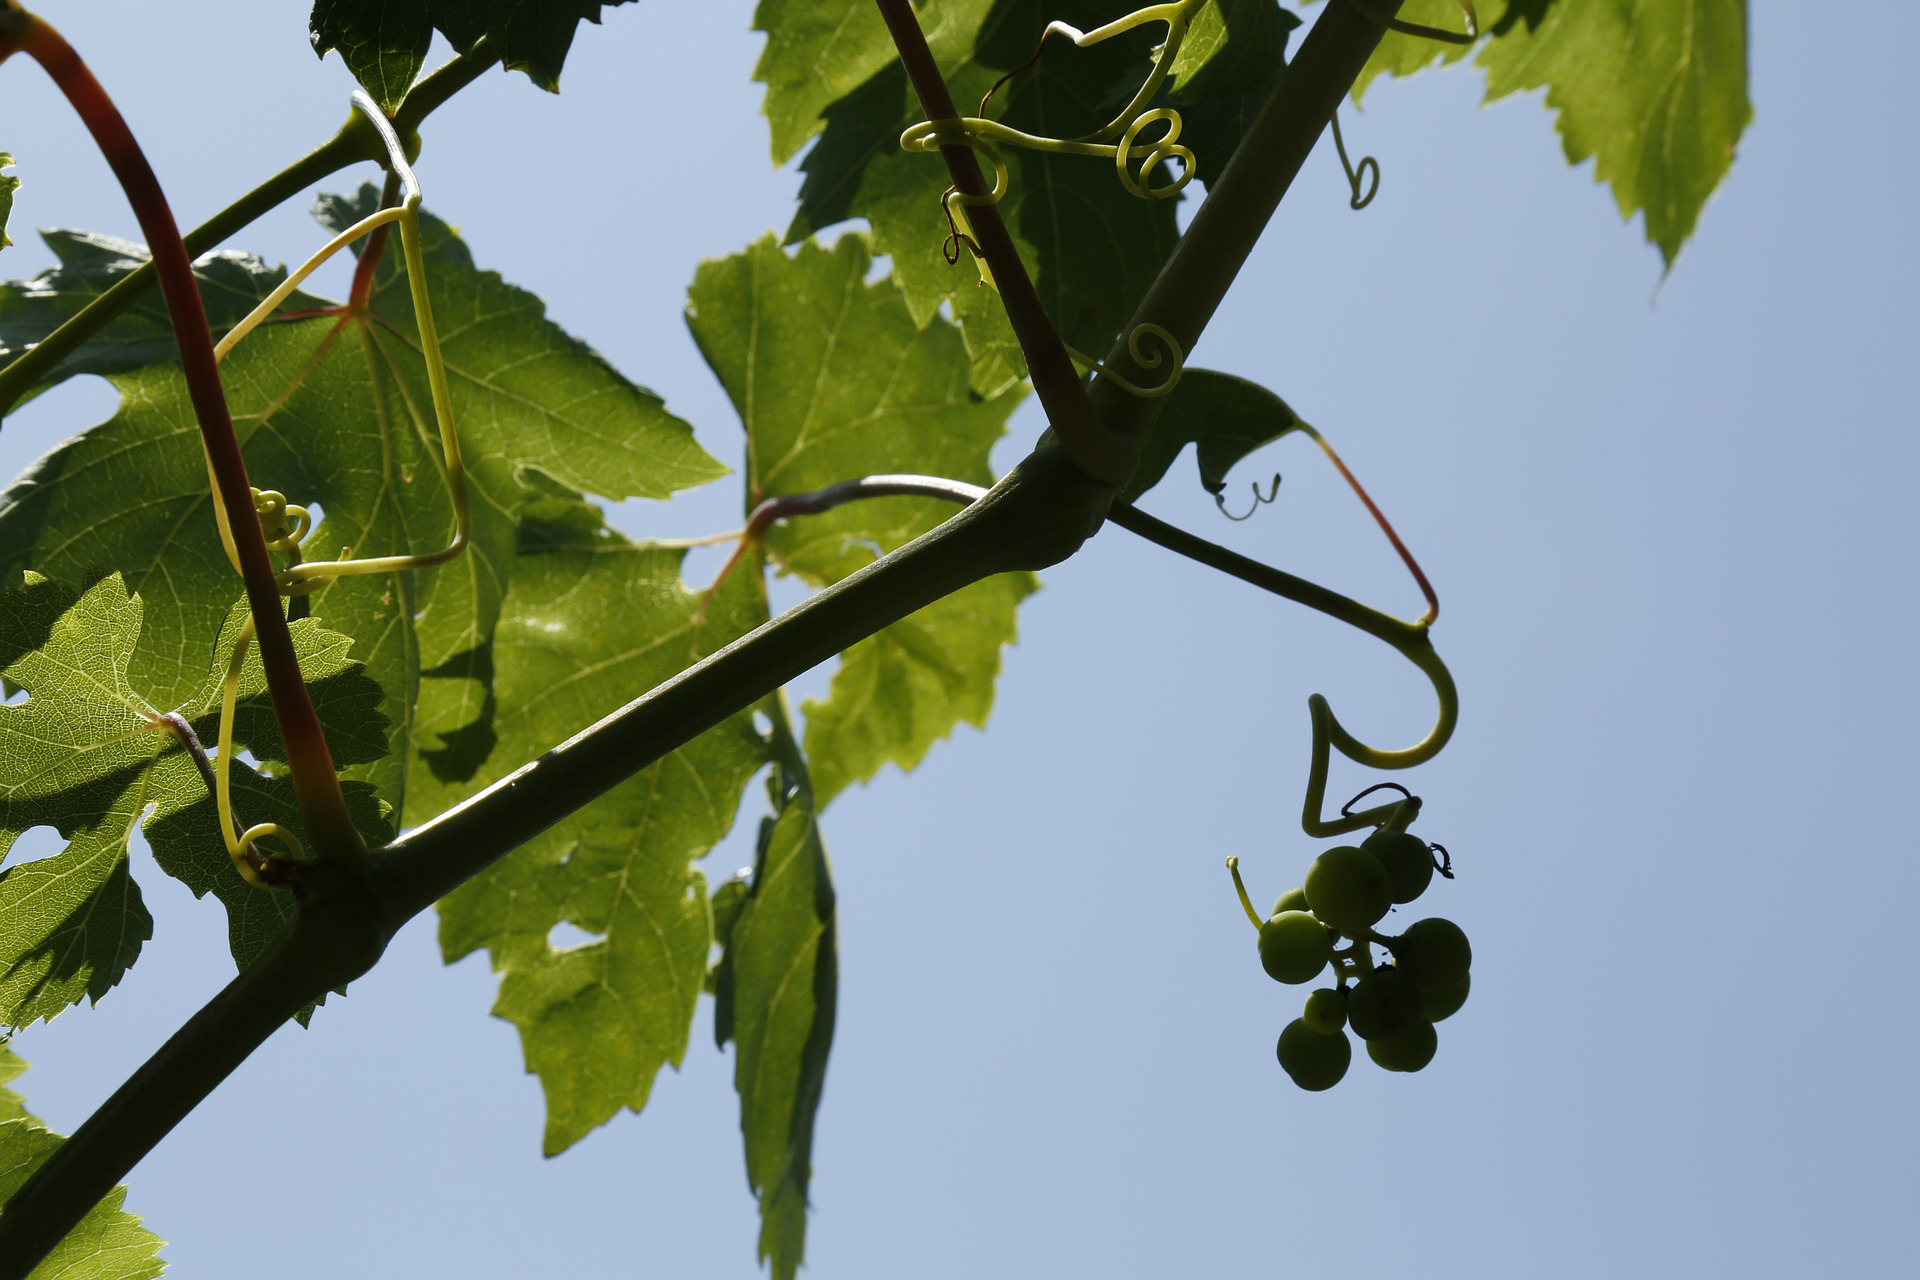 grapes-2171775_1920.jpg